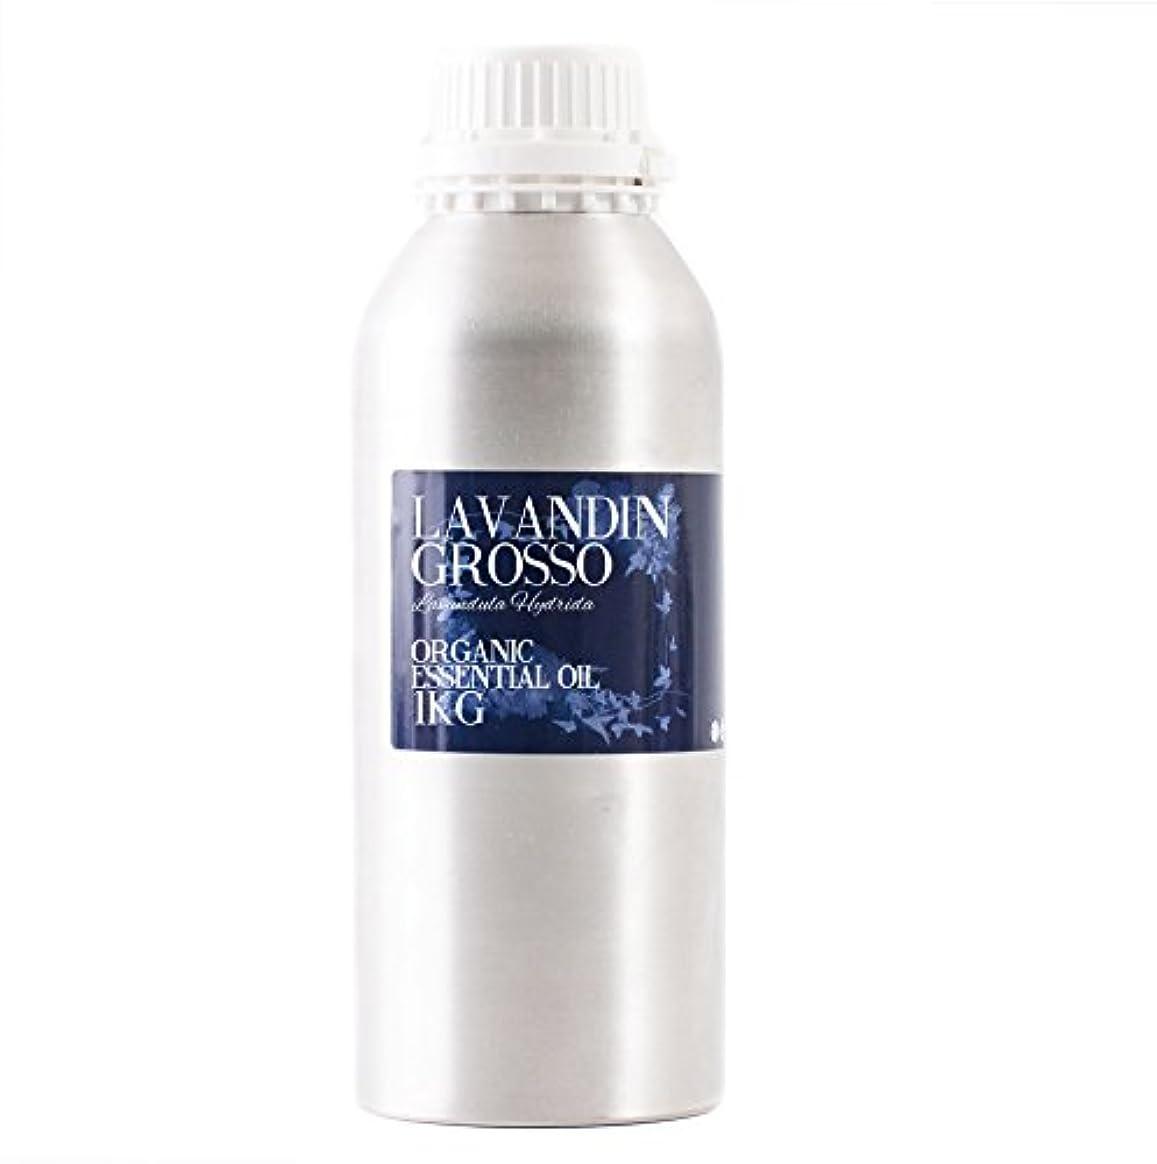 Mystic Moments | Lavandin Grosso Organic Essential Oil - 1Kg - 100% Pure